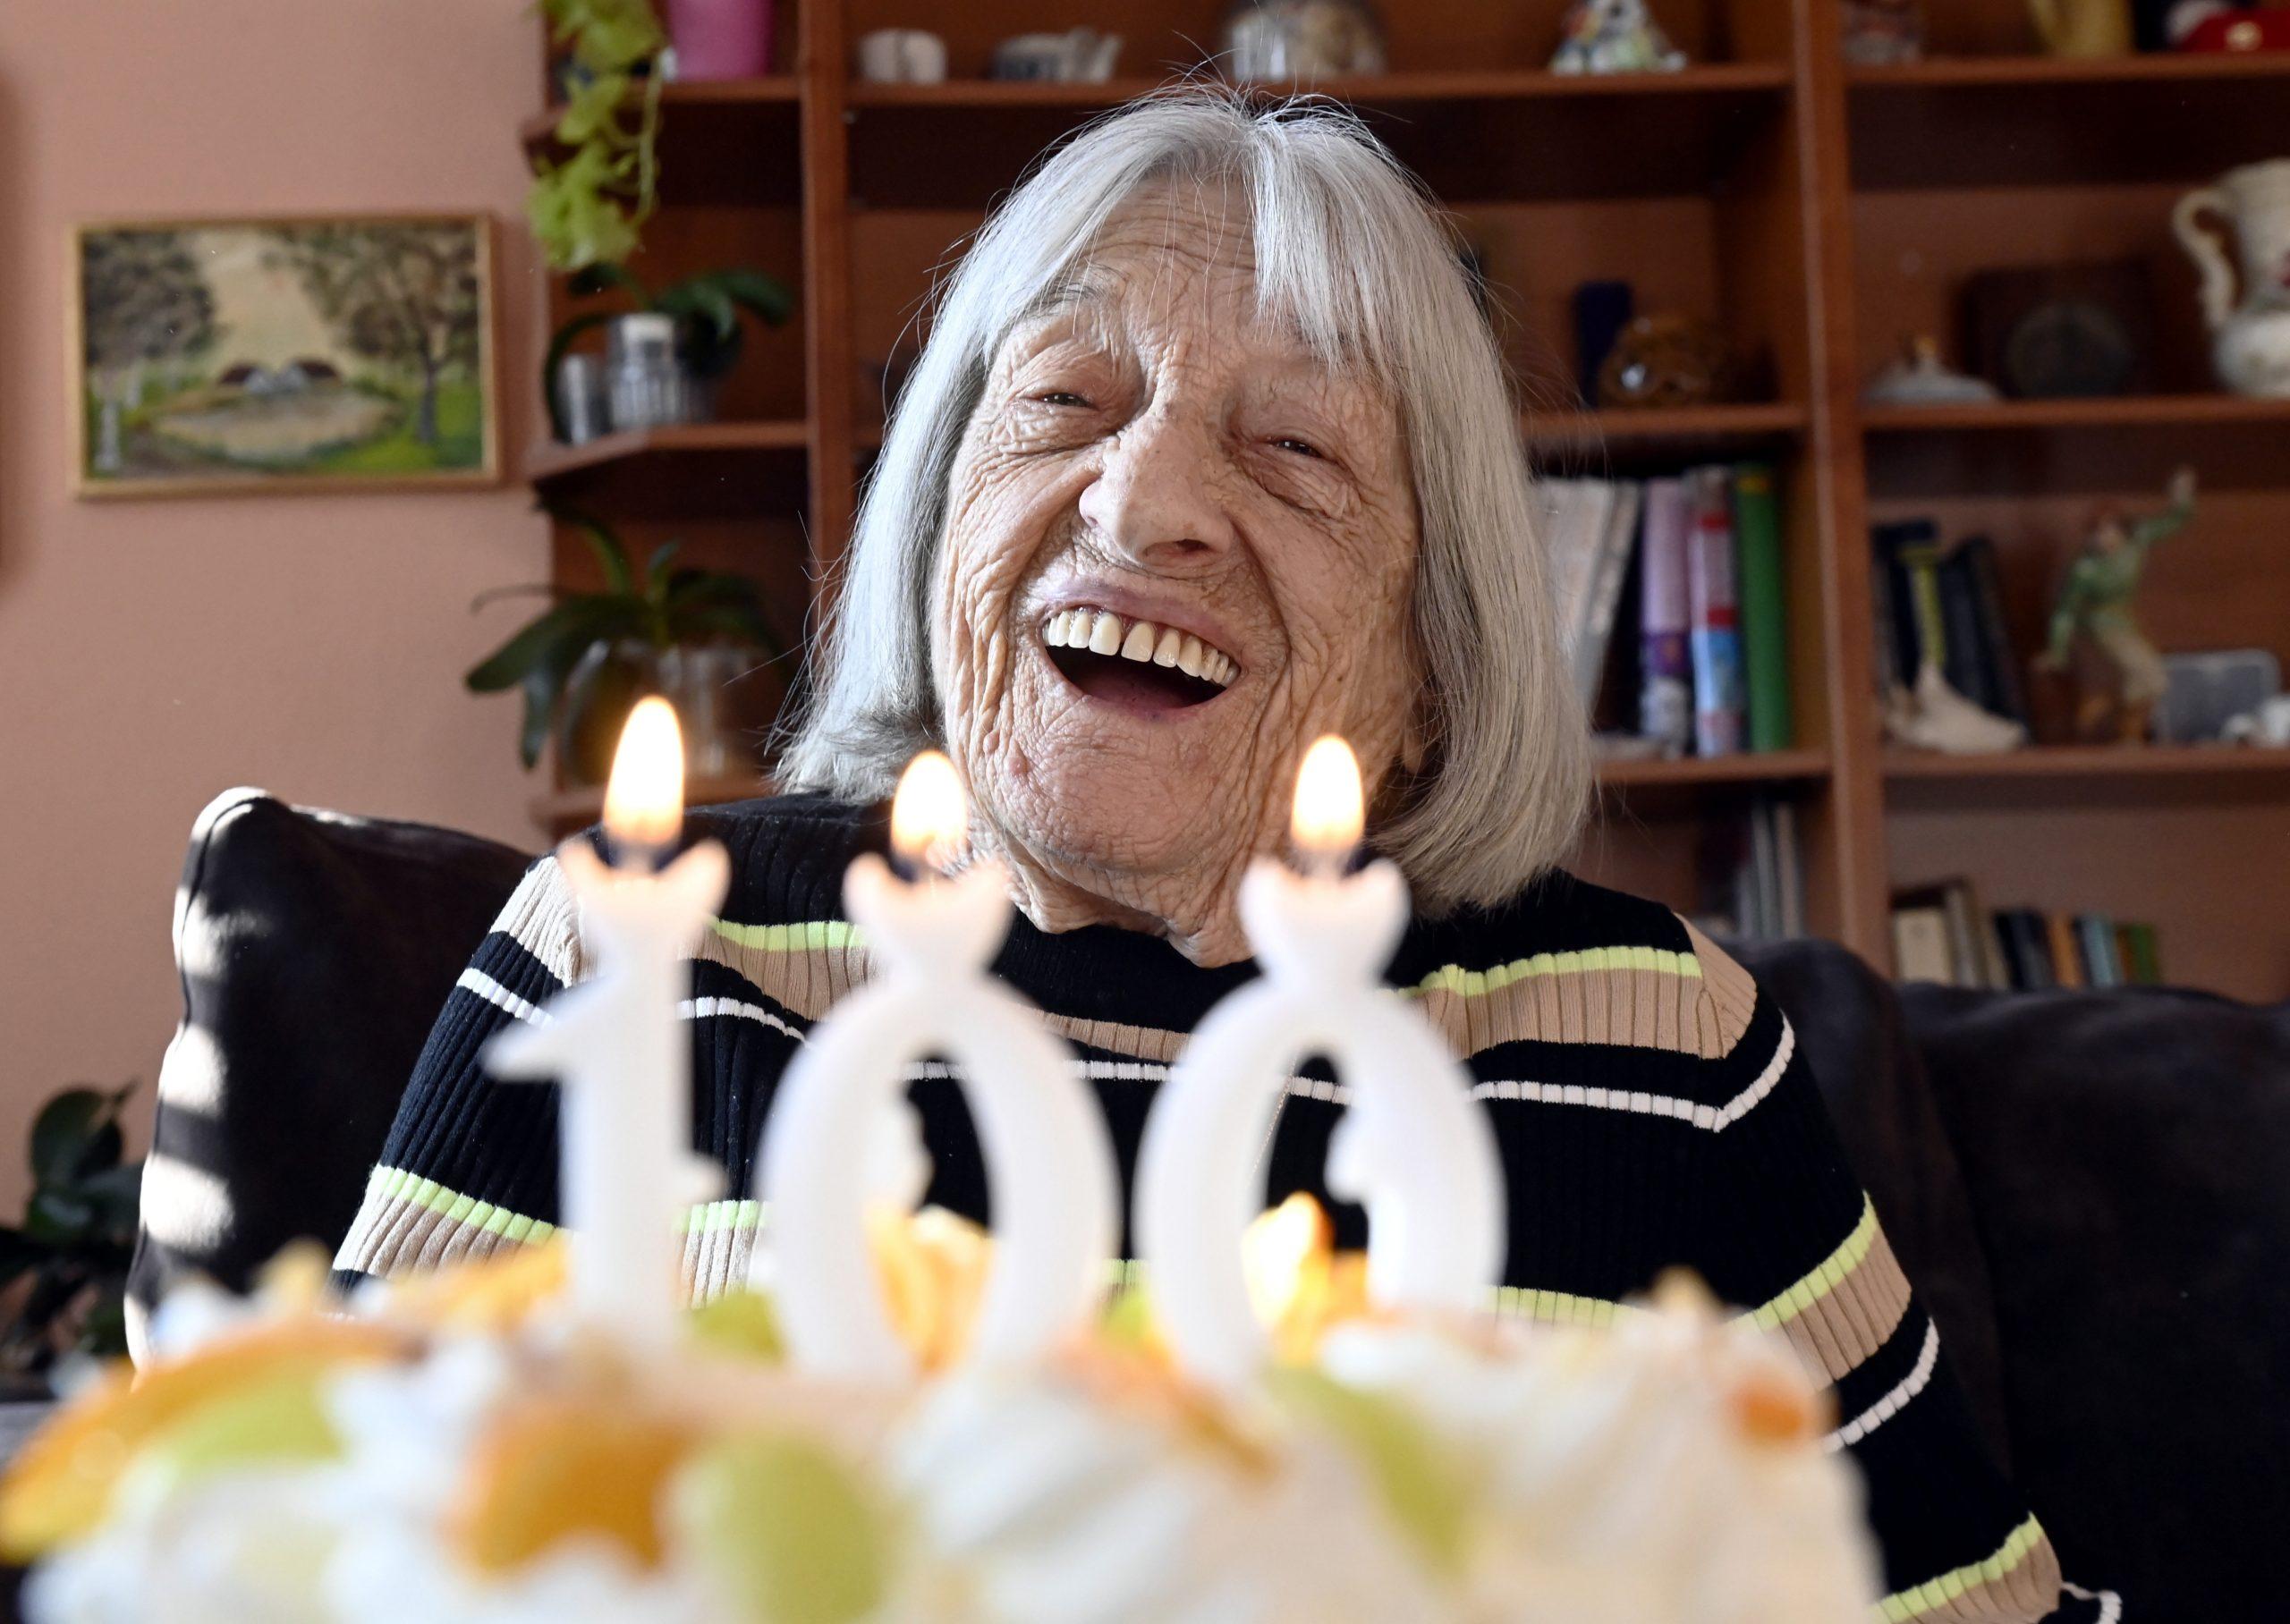 Ágnes Keleti, Oldest Living Olympic Champion Turns 100